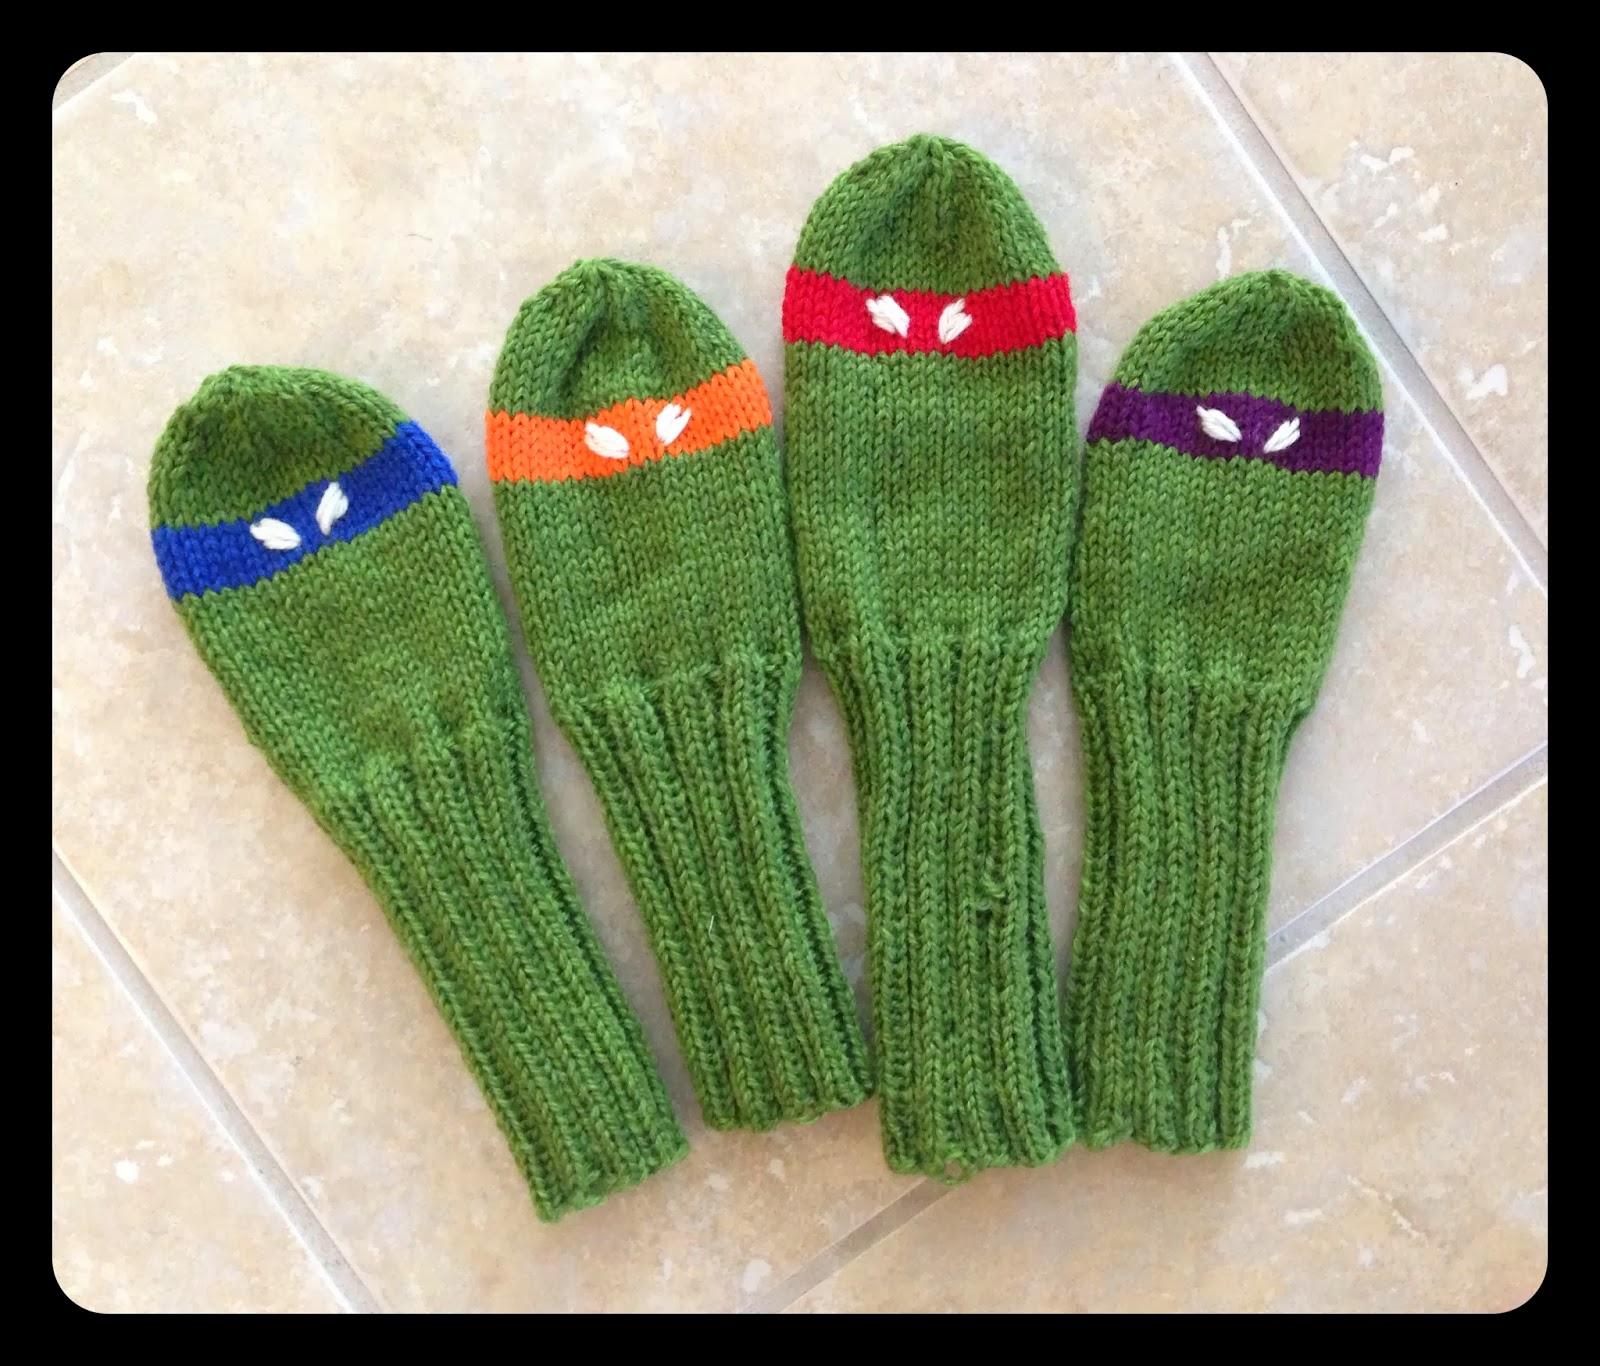 Ninja Turtle Golf Head Covers Knitting Pattern